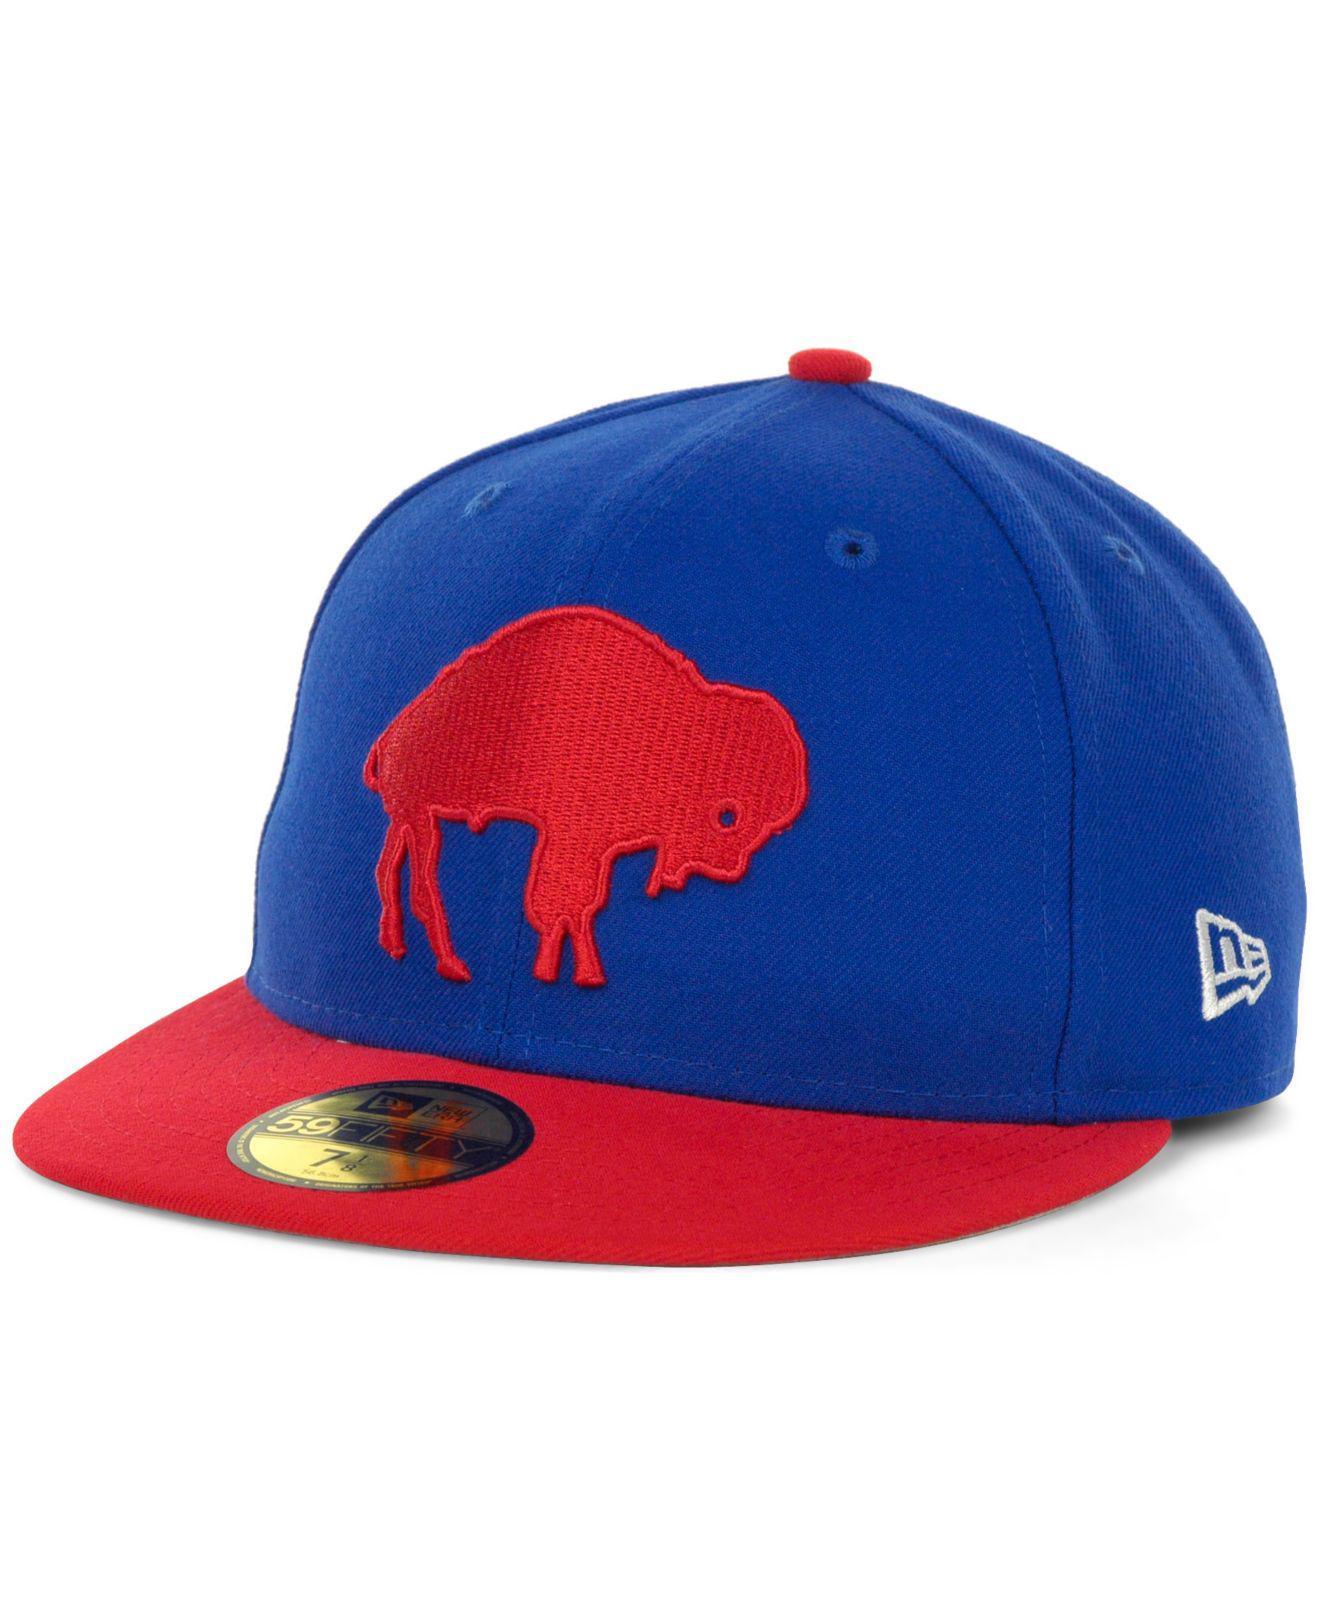 884af573437 Lyst - KTZ Buffalo Bills Historic 59fifty Hat in Red for Men